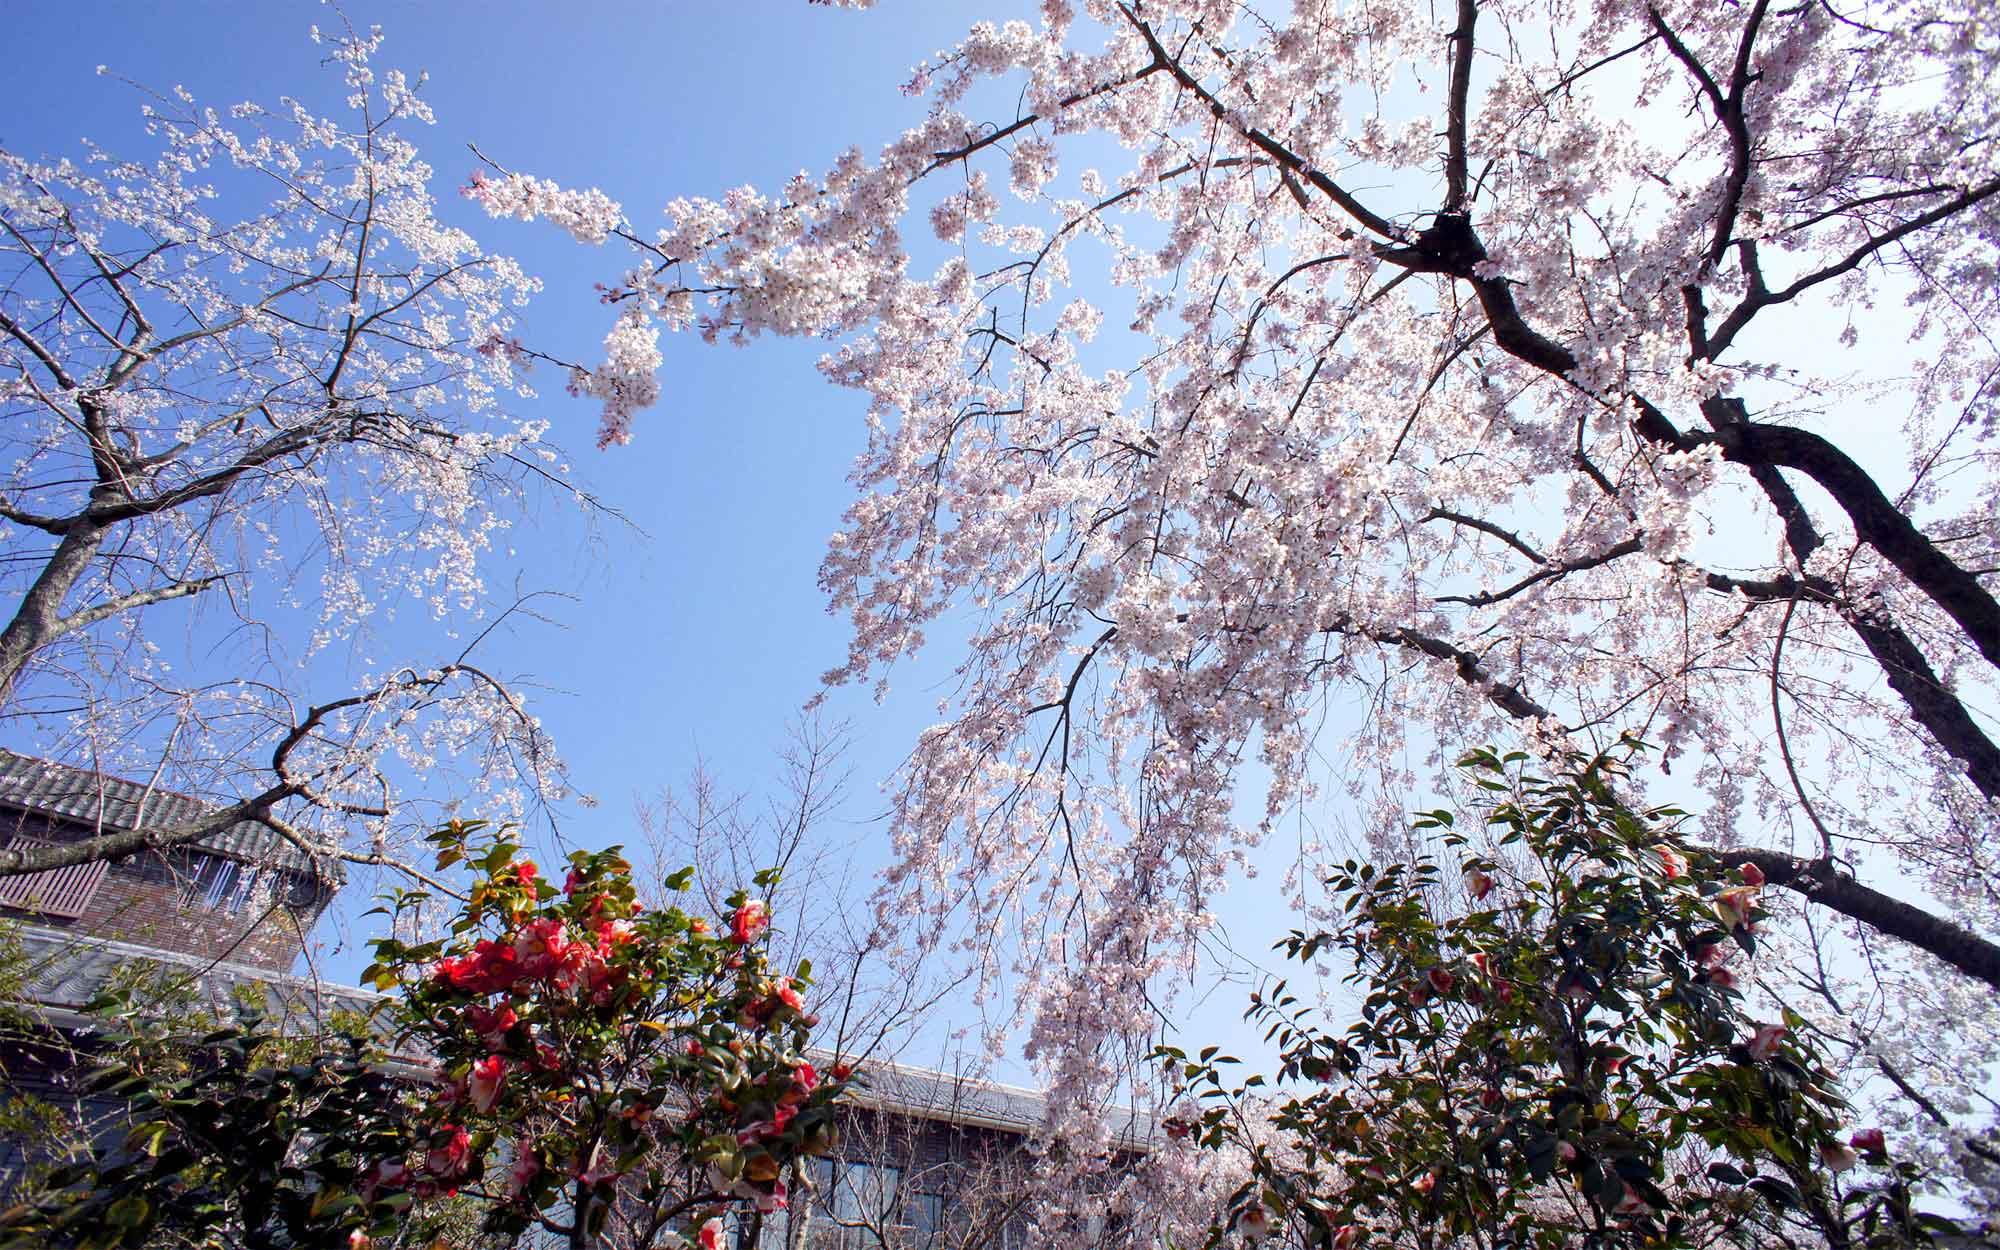 05北門ガーデン桜と椿 - 山口県 萩市|世界遺産[萩城下町]唯一の旅館 萩城三の丸 北門屋敷